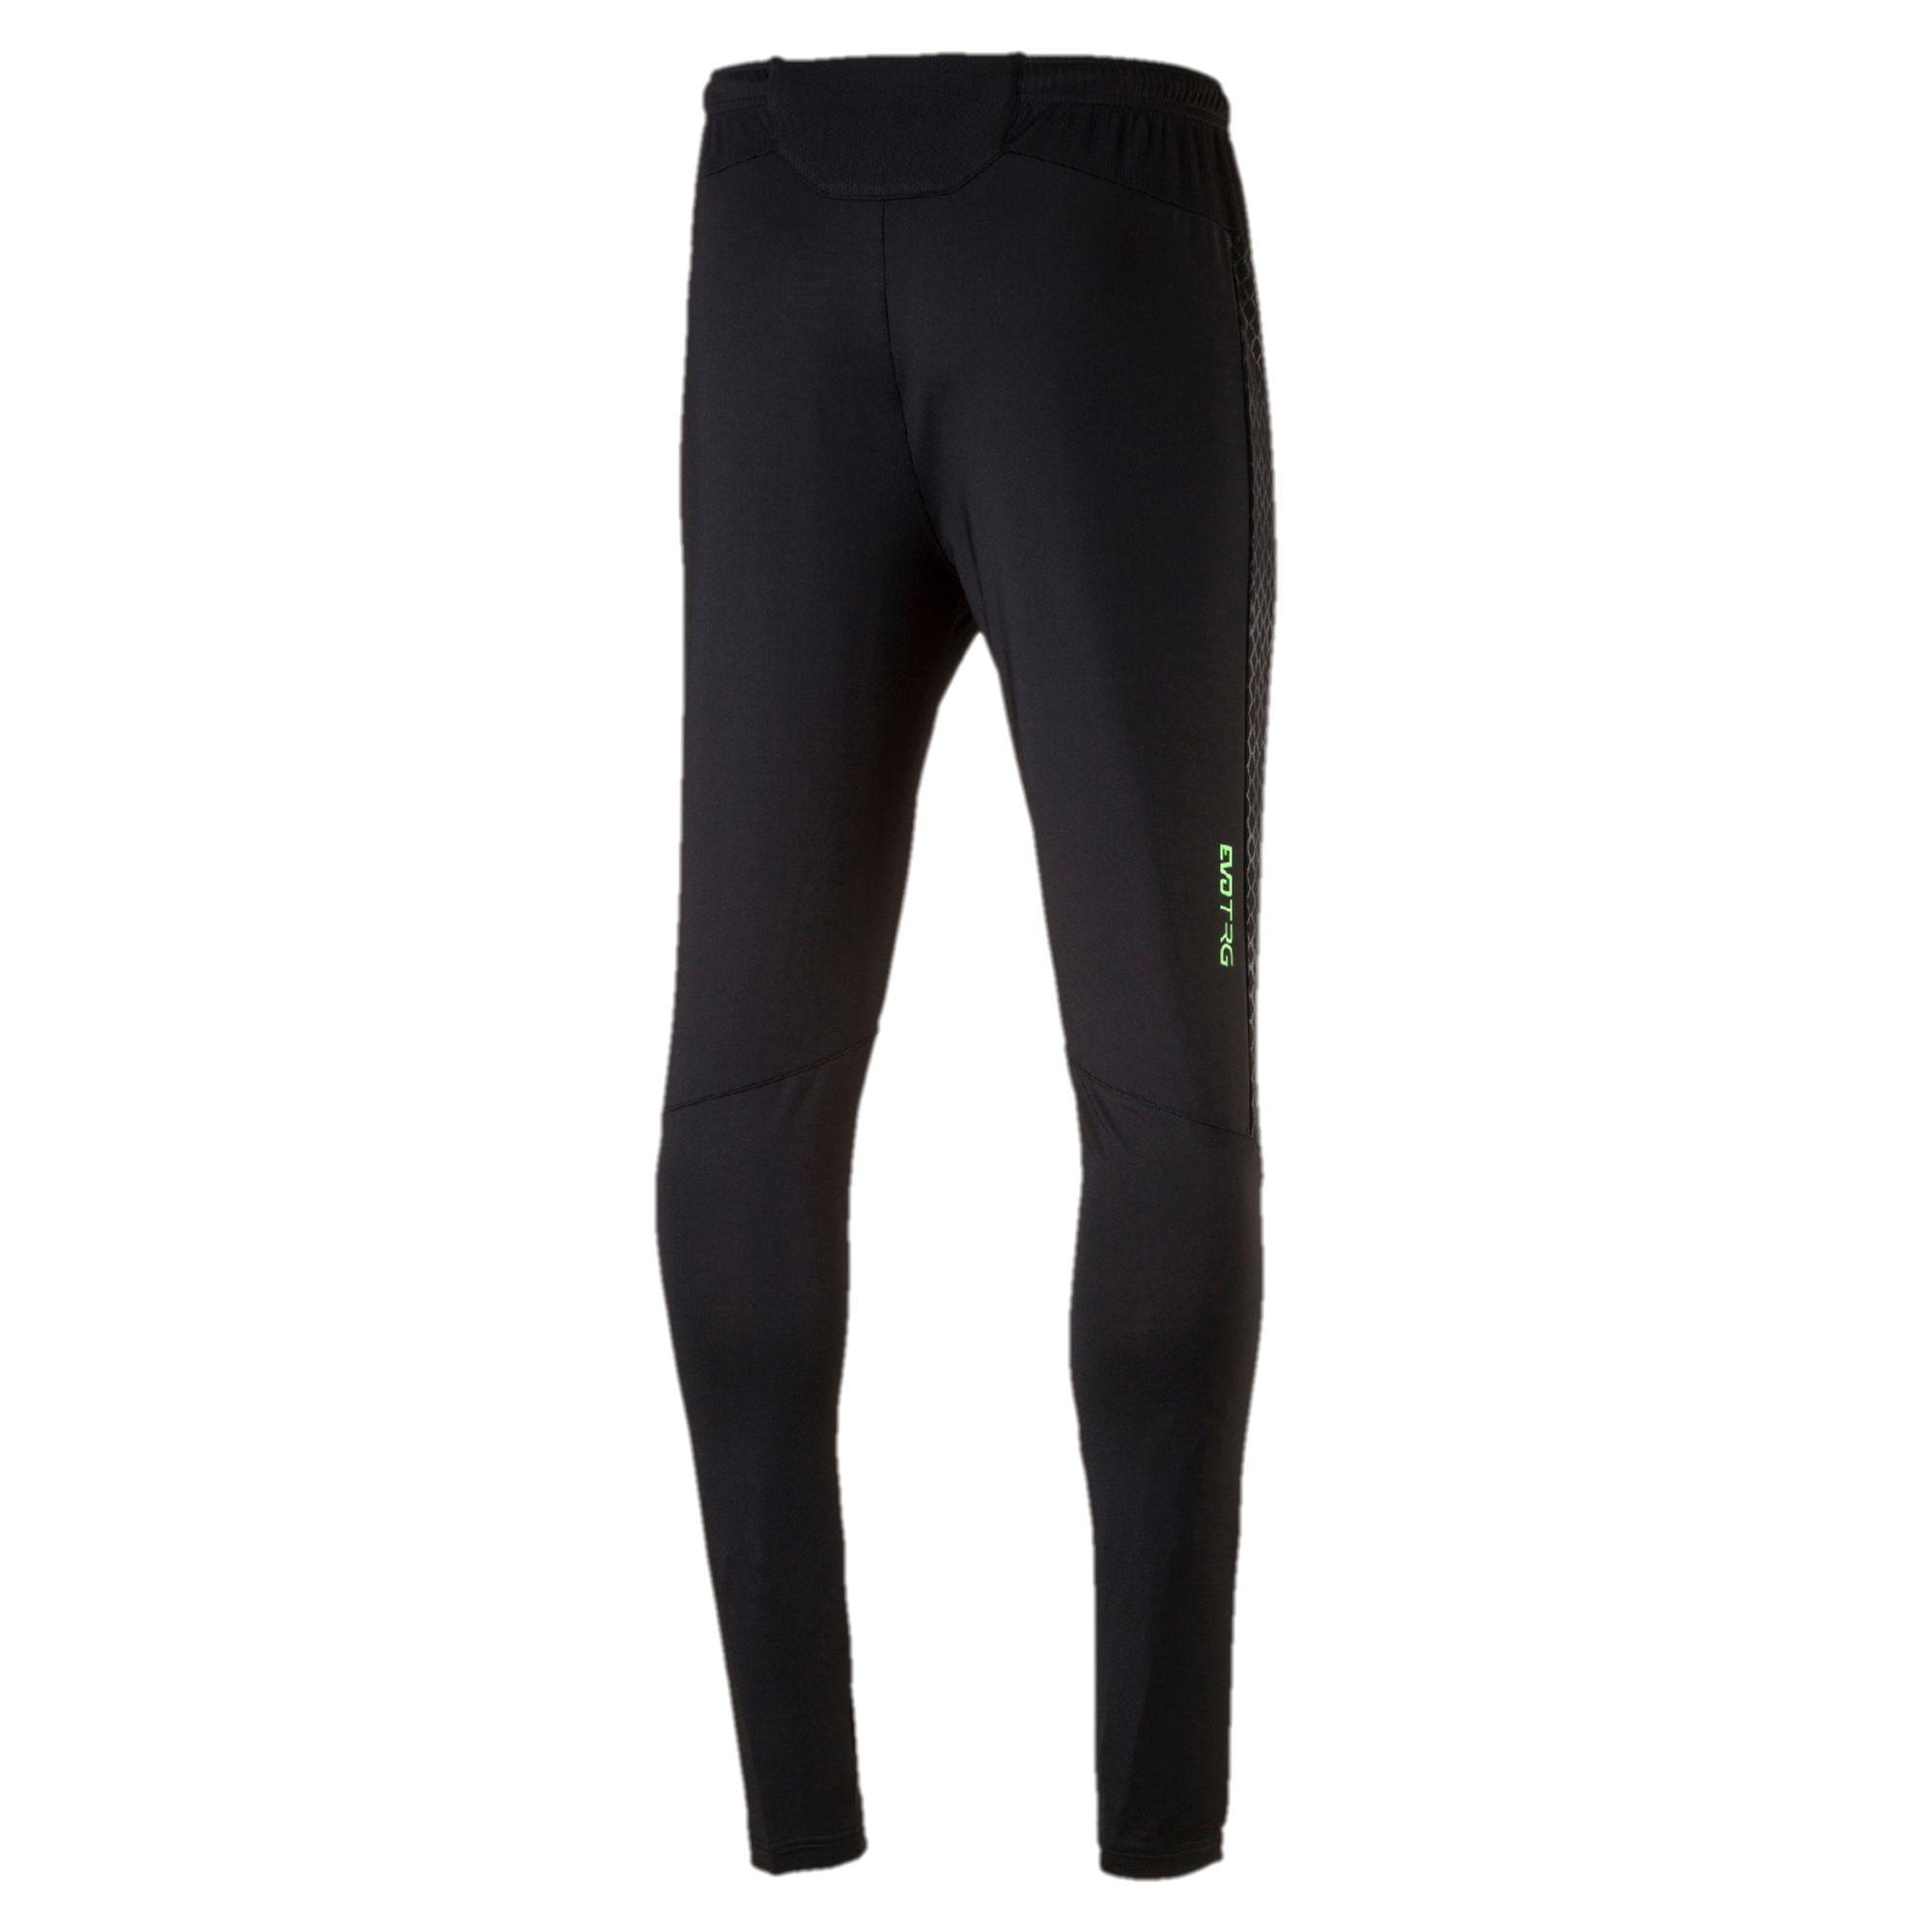 72e9136e2267 Lyst - Puma Evotrg Elite Training Pants in Black for Men